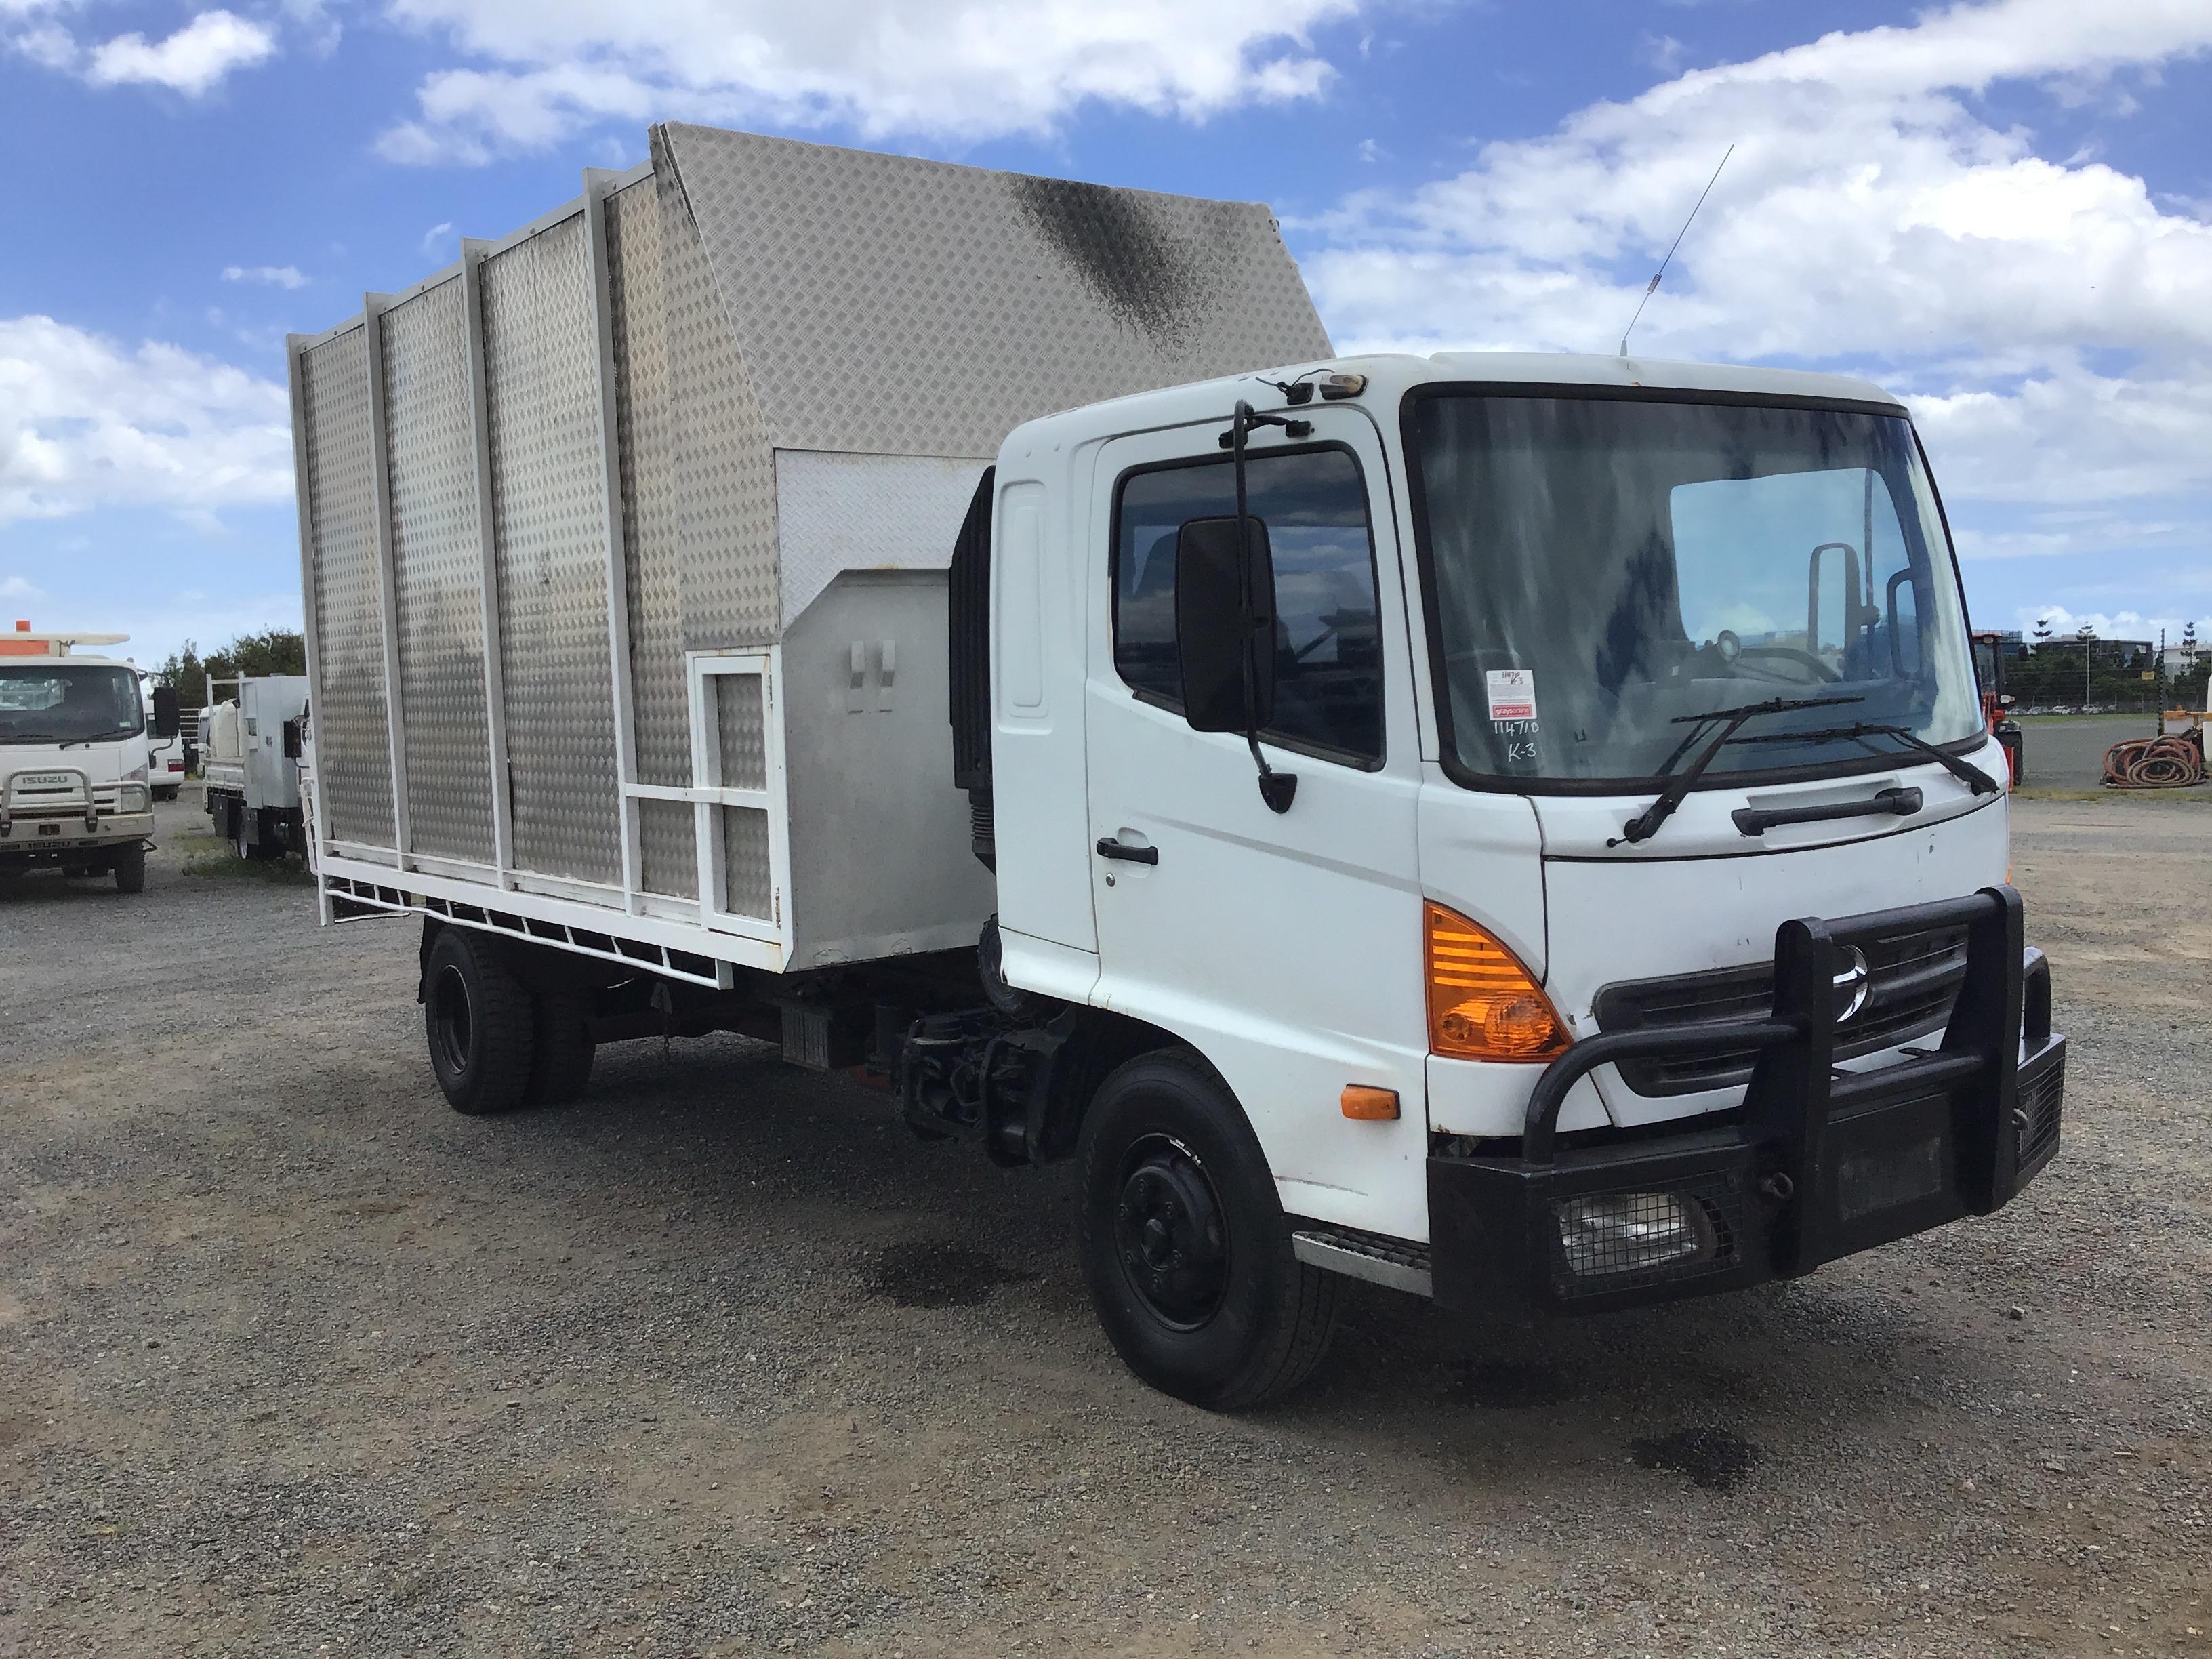 2003 Hino FD 4 x 2 Chipper Tipper Truck